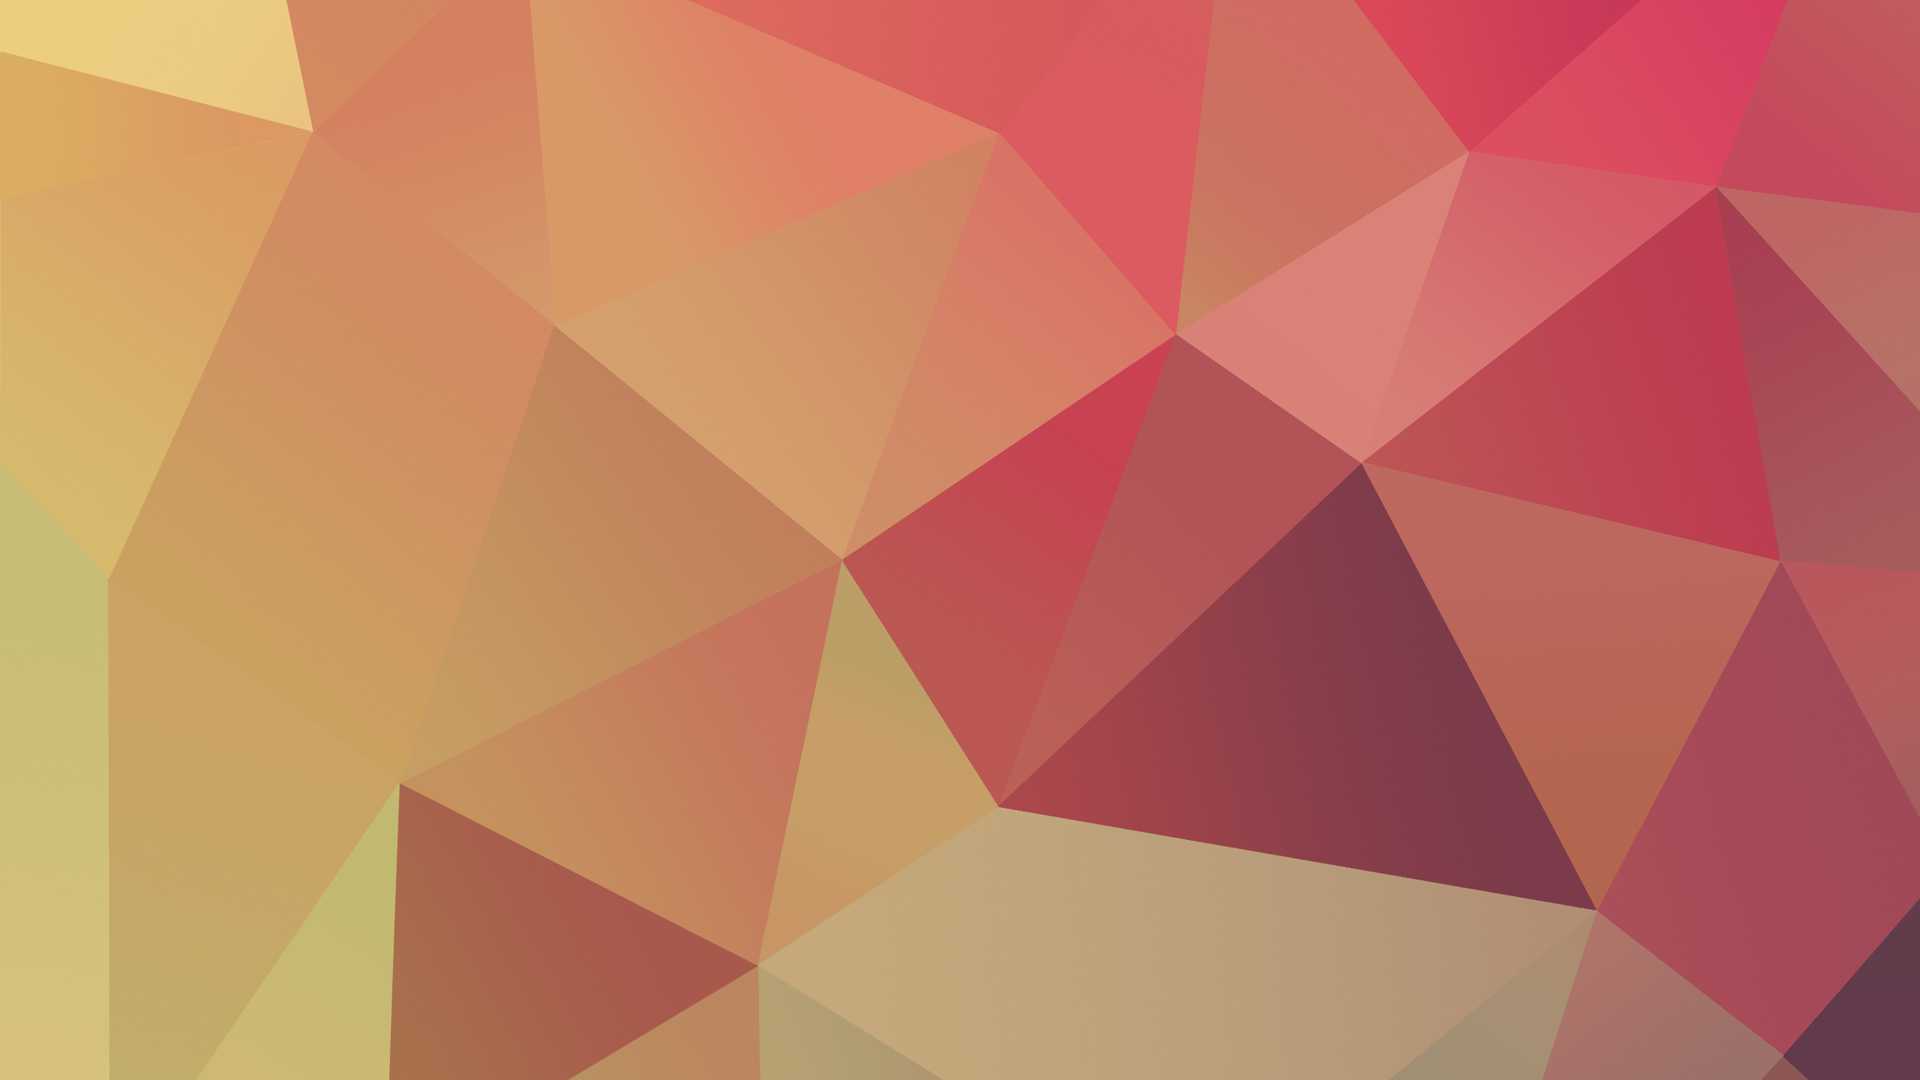 geometric hd wallpaper widescreen 1920x1080 - photo #26